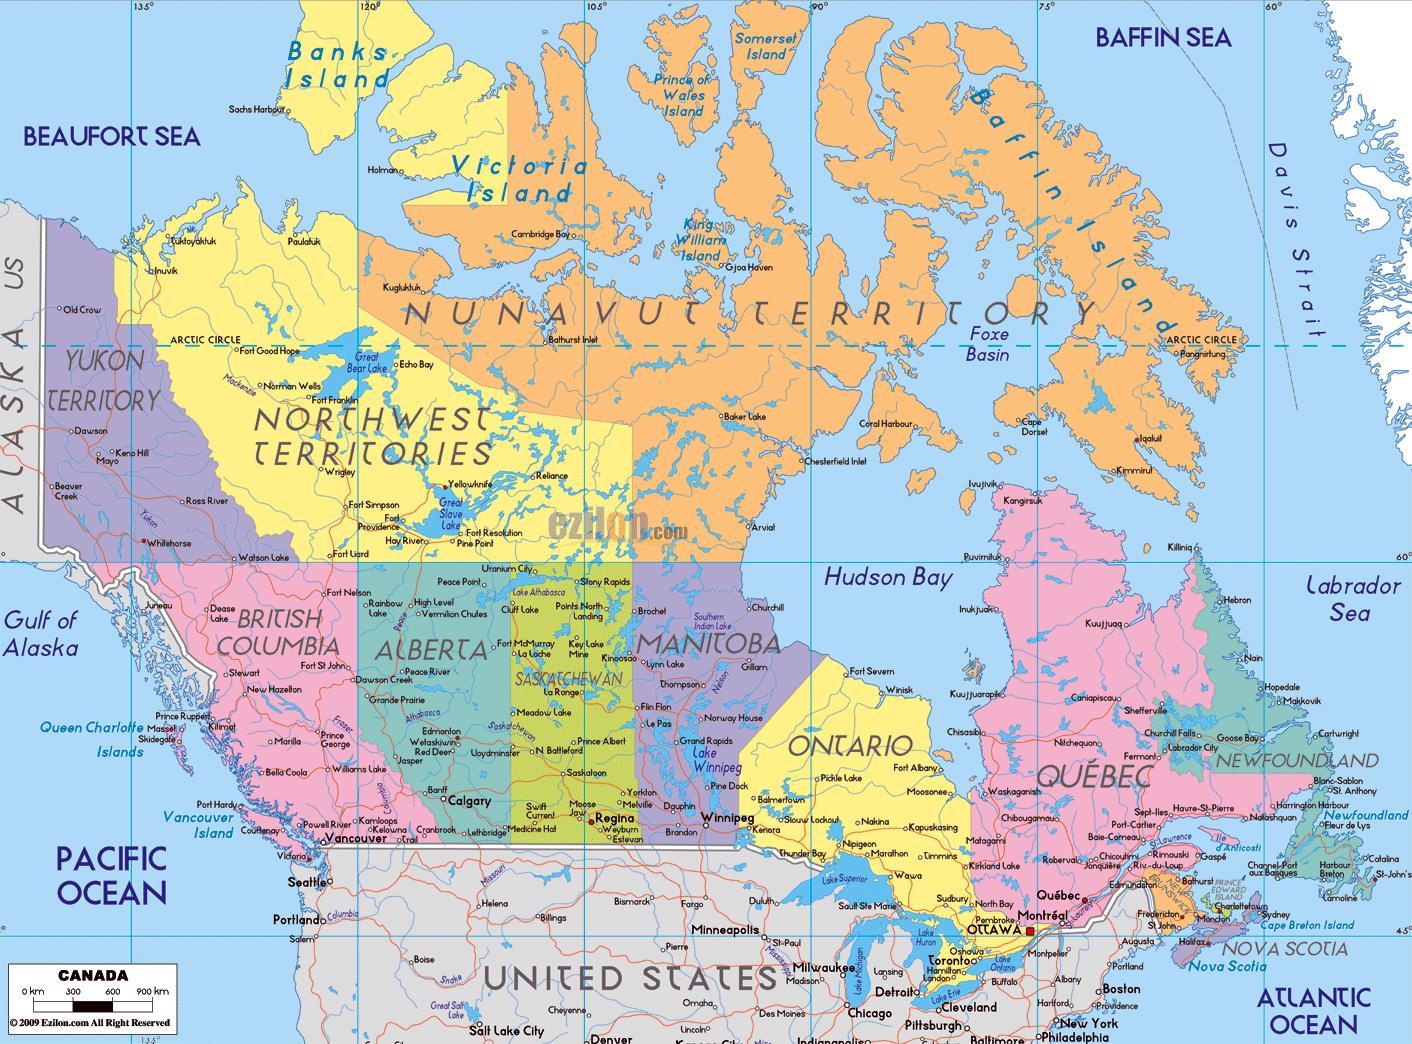 Carte Canada Avec Ville.Canada Carte Avec Les Noms De Ville Carte Detaillee Du Canada Avec